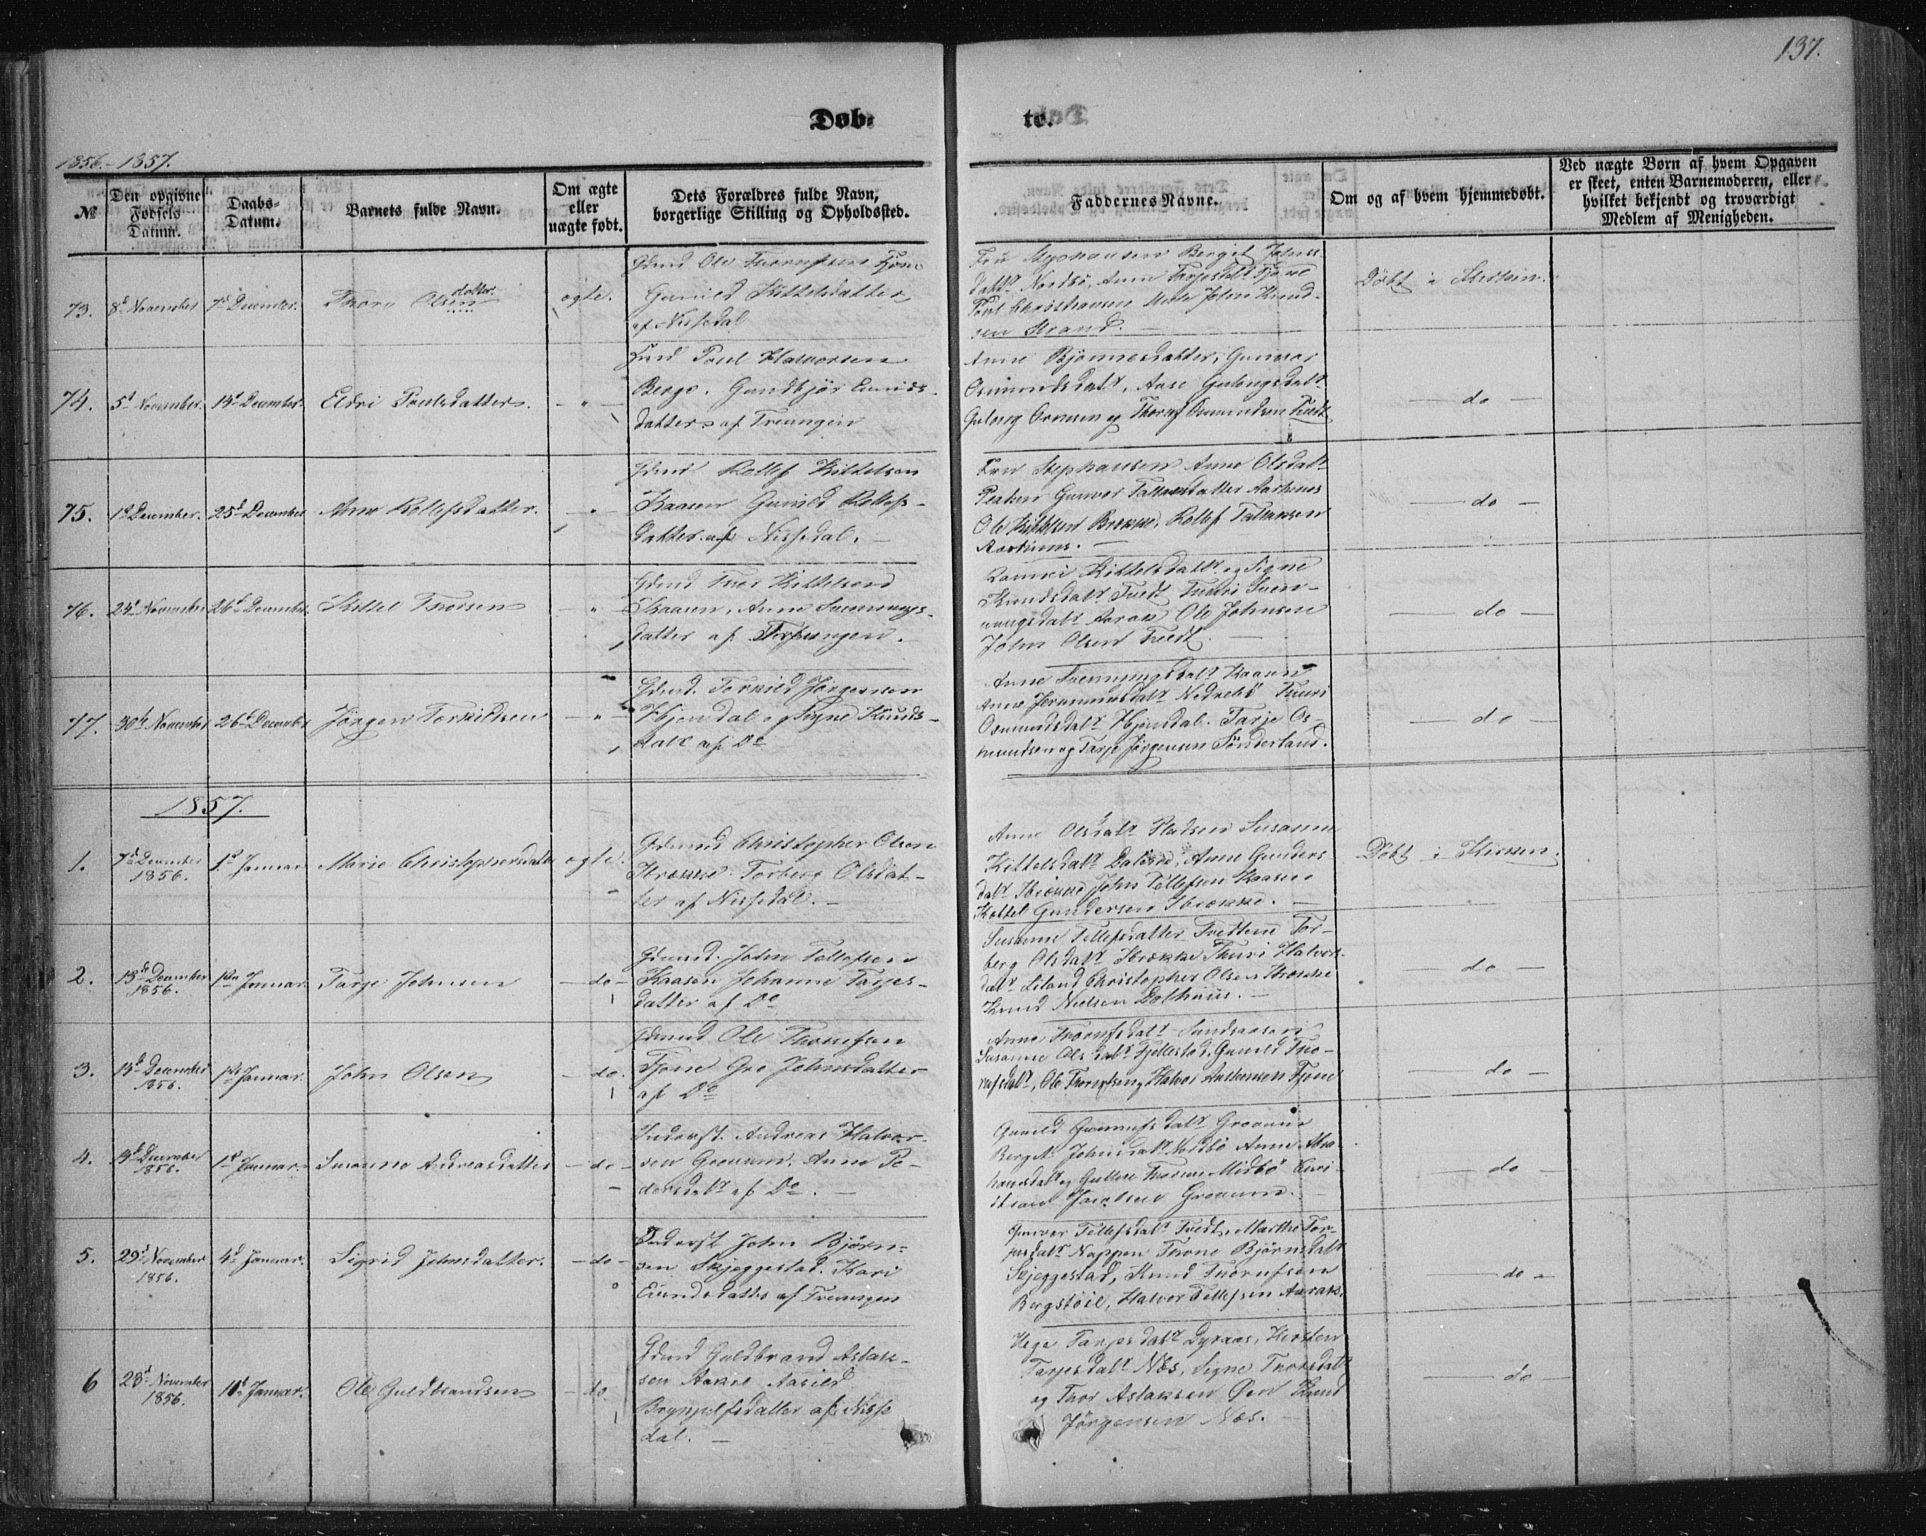 SAKO, Nissedal kirkebøker, F/Fa/L0003: Ministerialbok nr. I 3, 1846-1870, s. 136-137